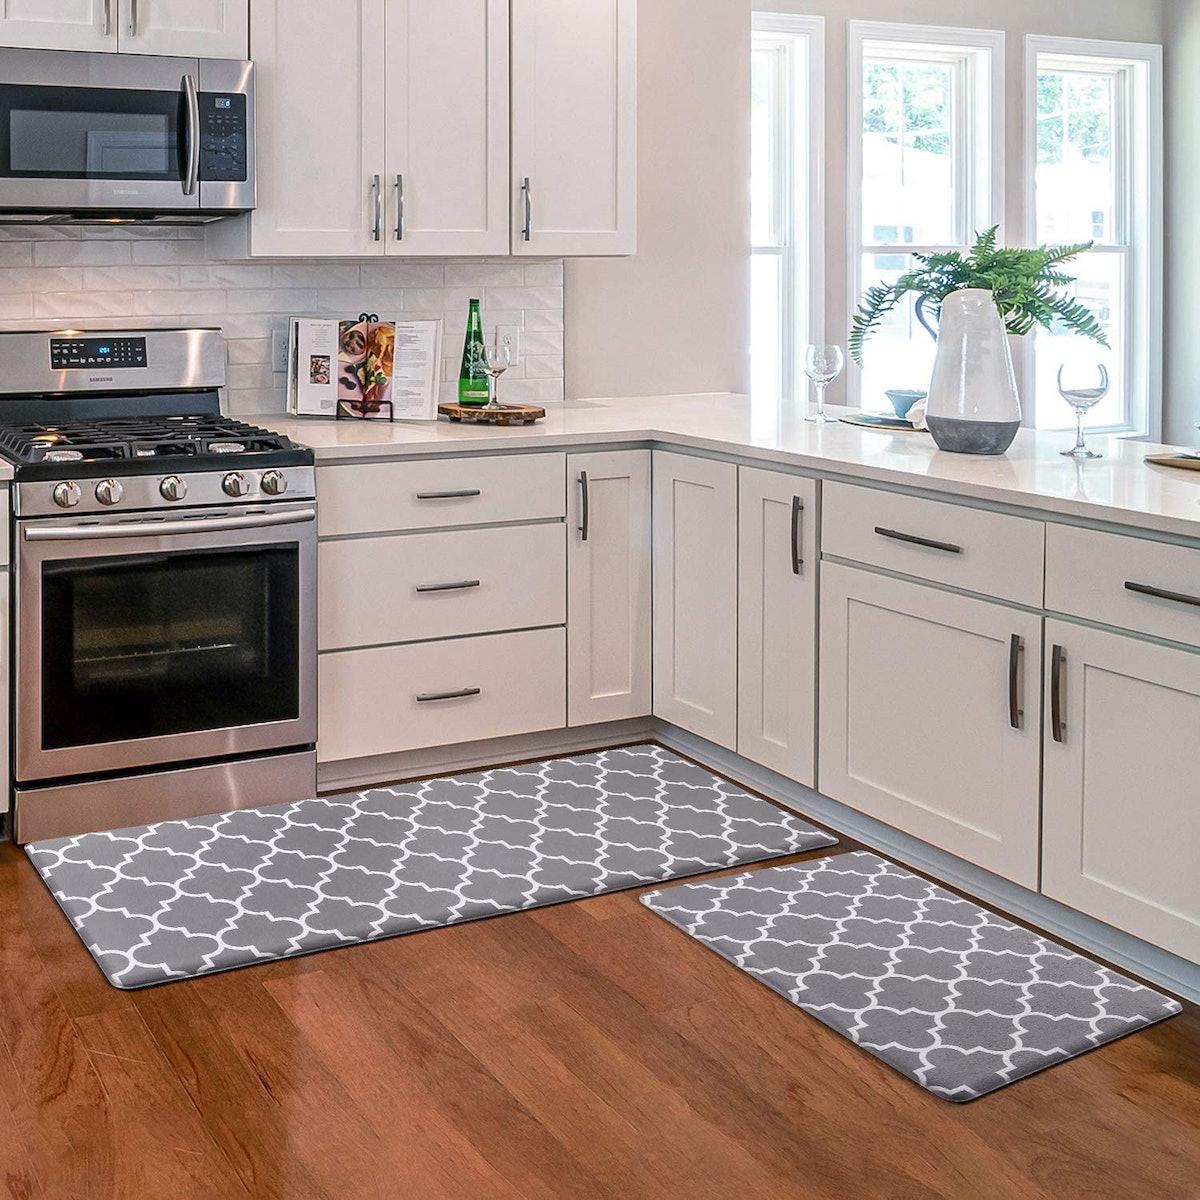 KMAT Cushioned Kitchen Mat (Set of 2)